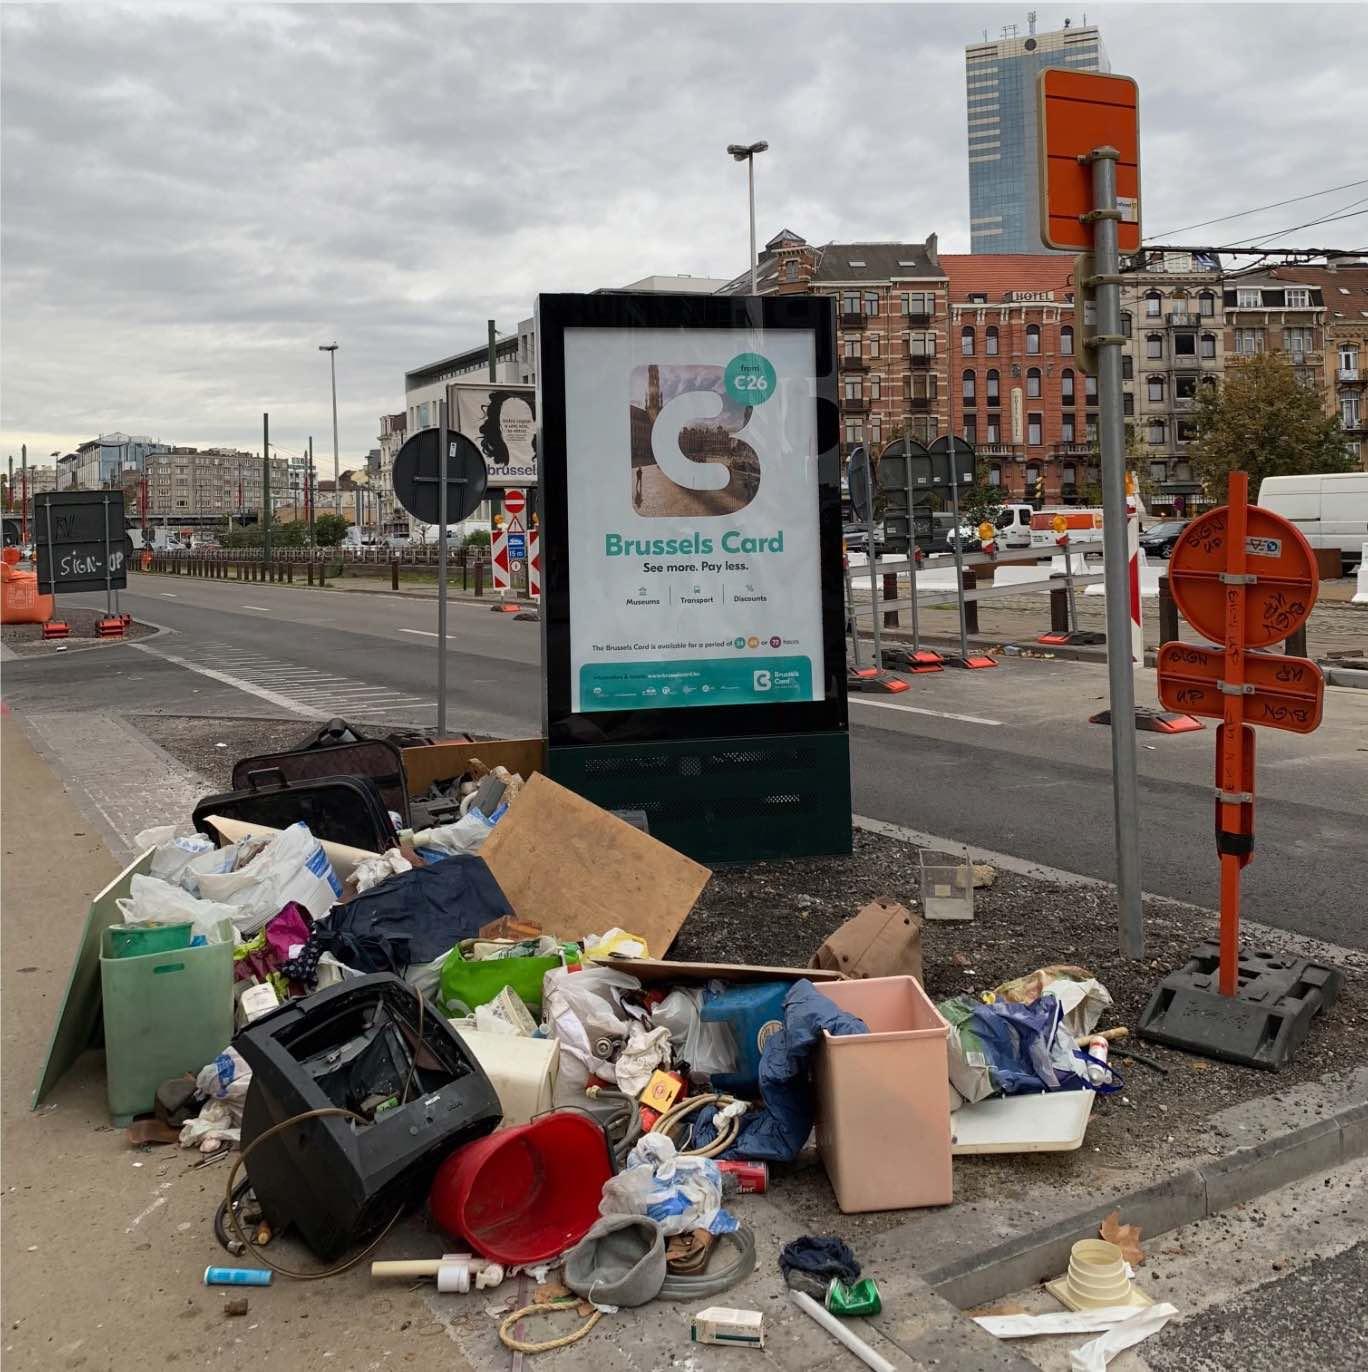 Dump rubbish man van container park cargo taxi